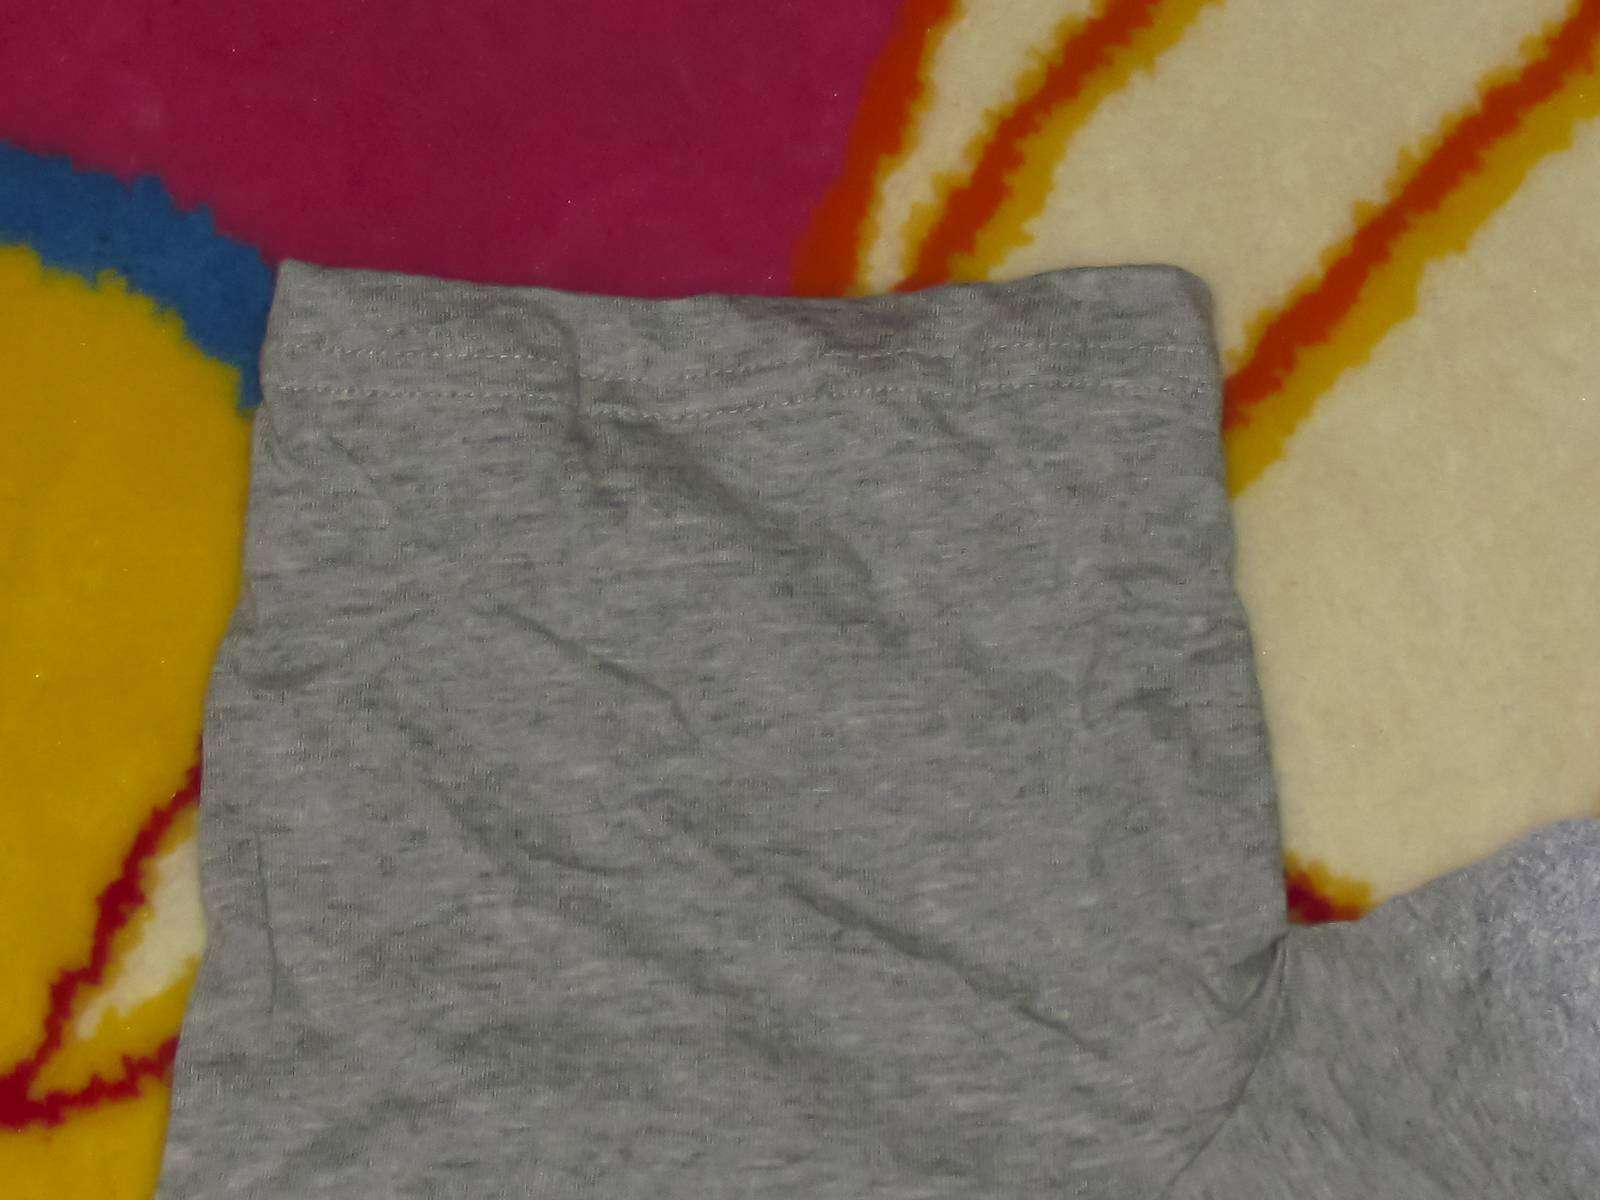 Childrens Place: Обзор футболки с мотоциклом, для мальчика, размер XL (14)